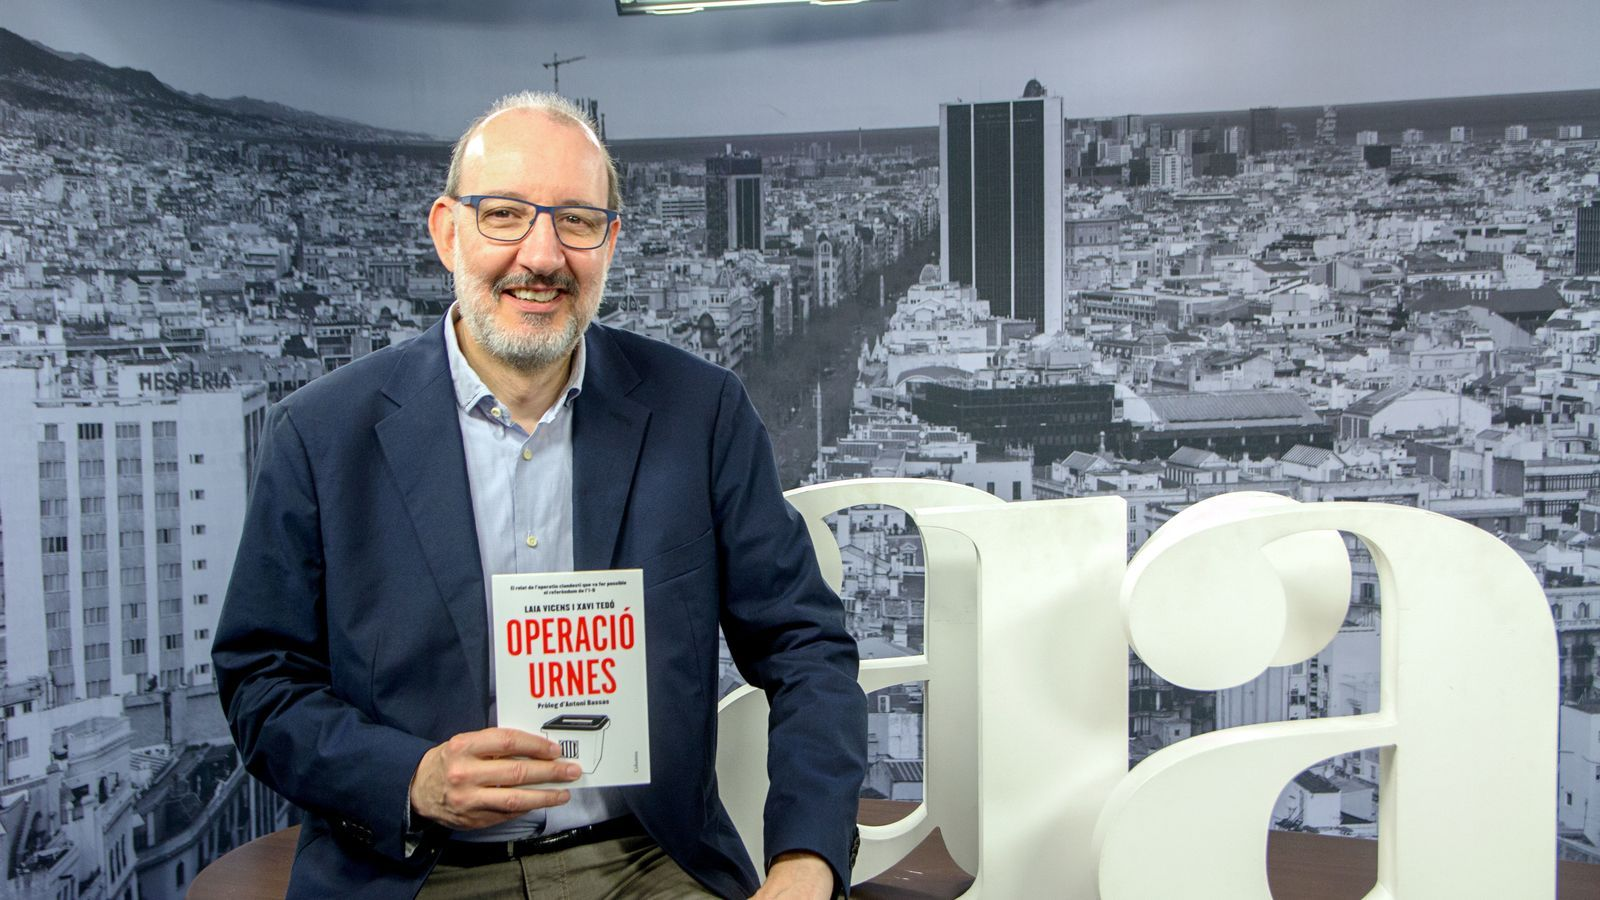 L'anàlisi d'Antoni Bassas: 'Les urnes sempre guanyen'